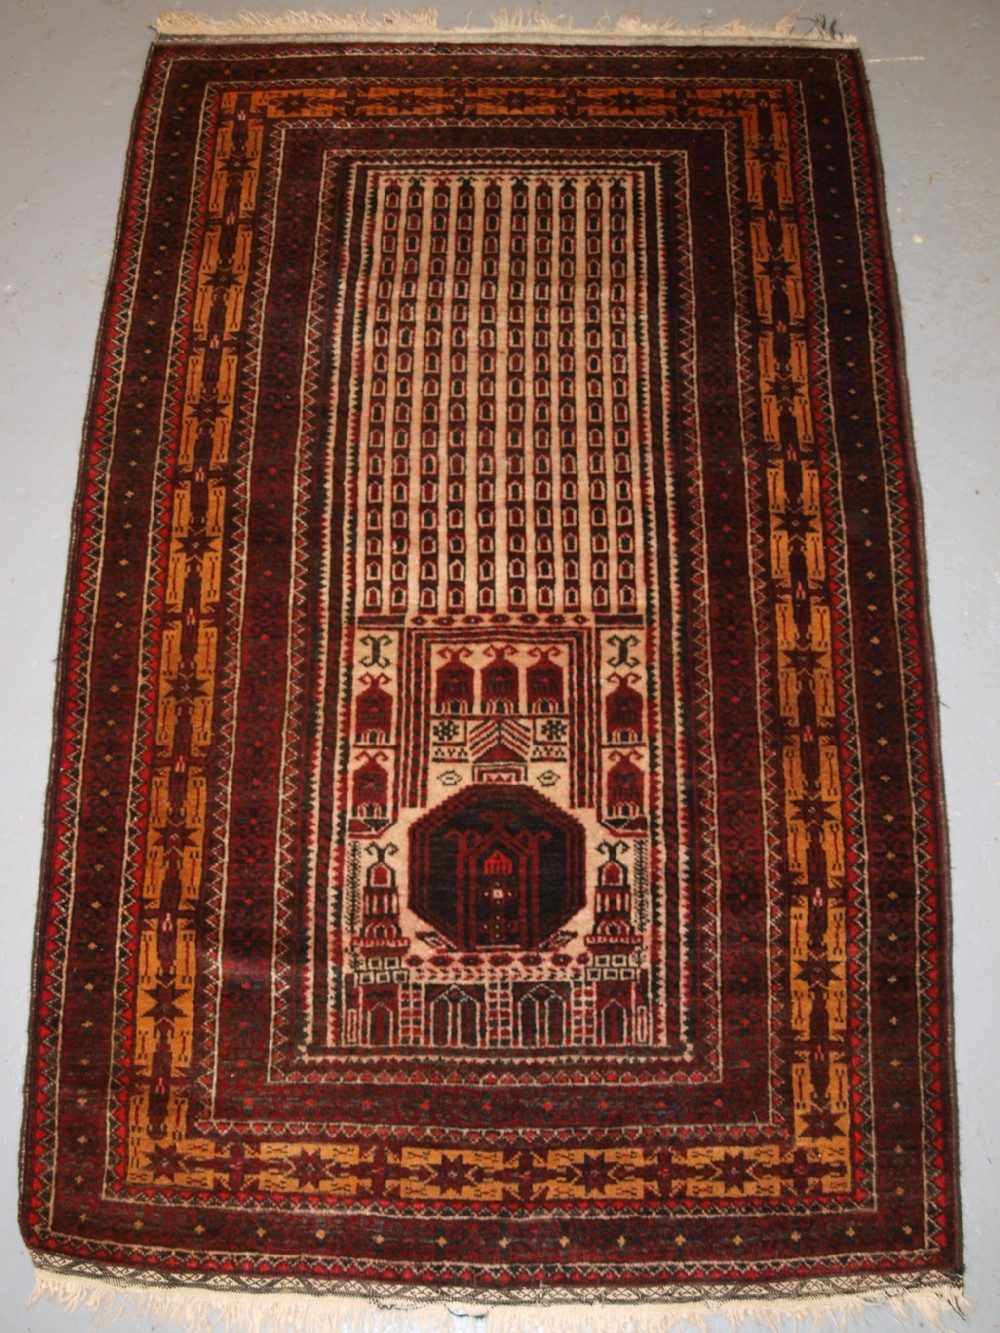 old afghan kizil ayak mosque prayer rug unusual design circa 1920